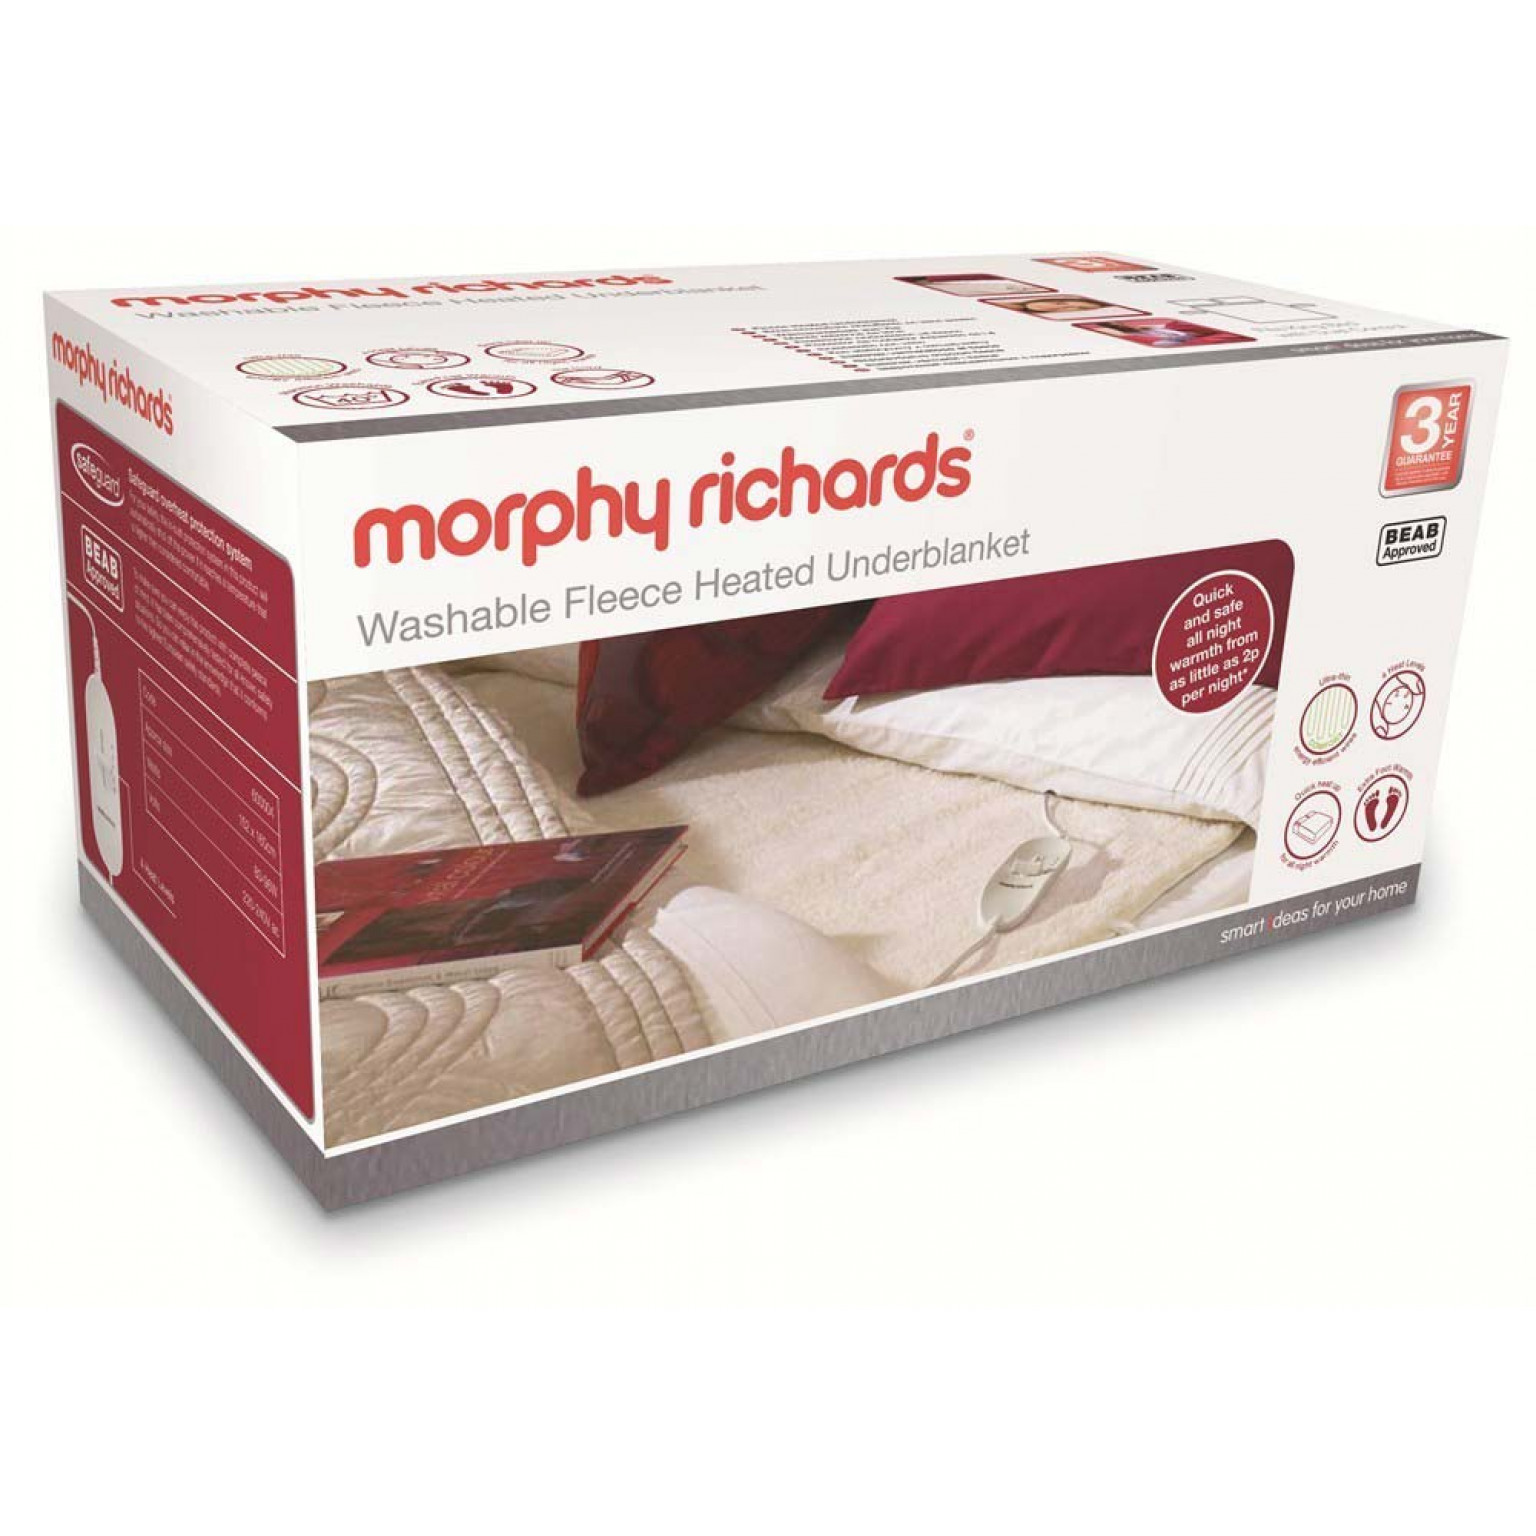 Morphy Richards Fleece Heated Mattress Cover | King Size